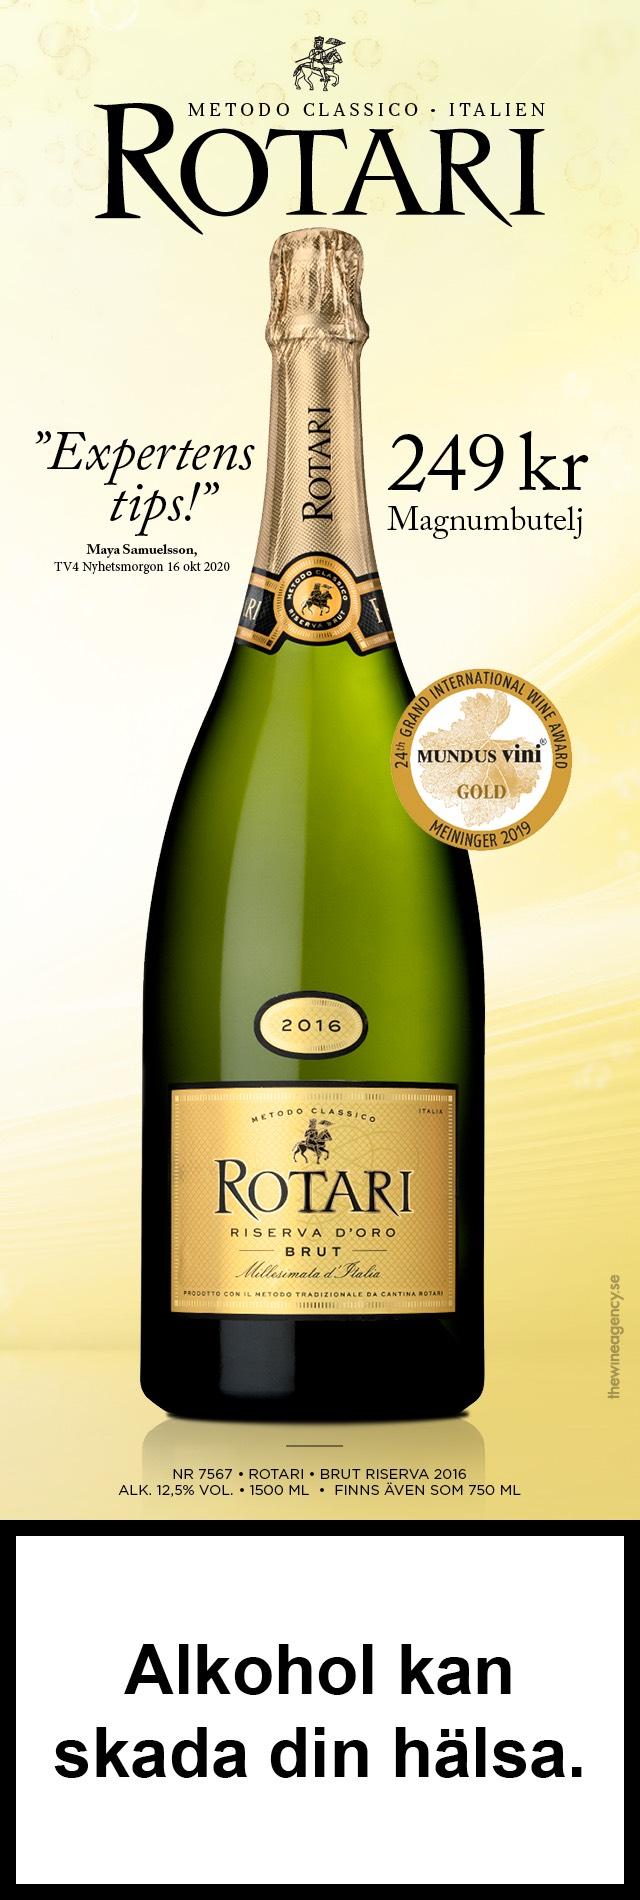 Italiens bästa mousserande: Rotari